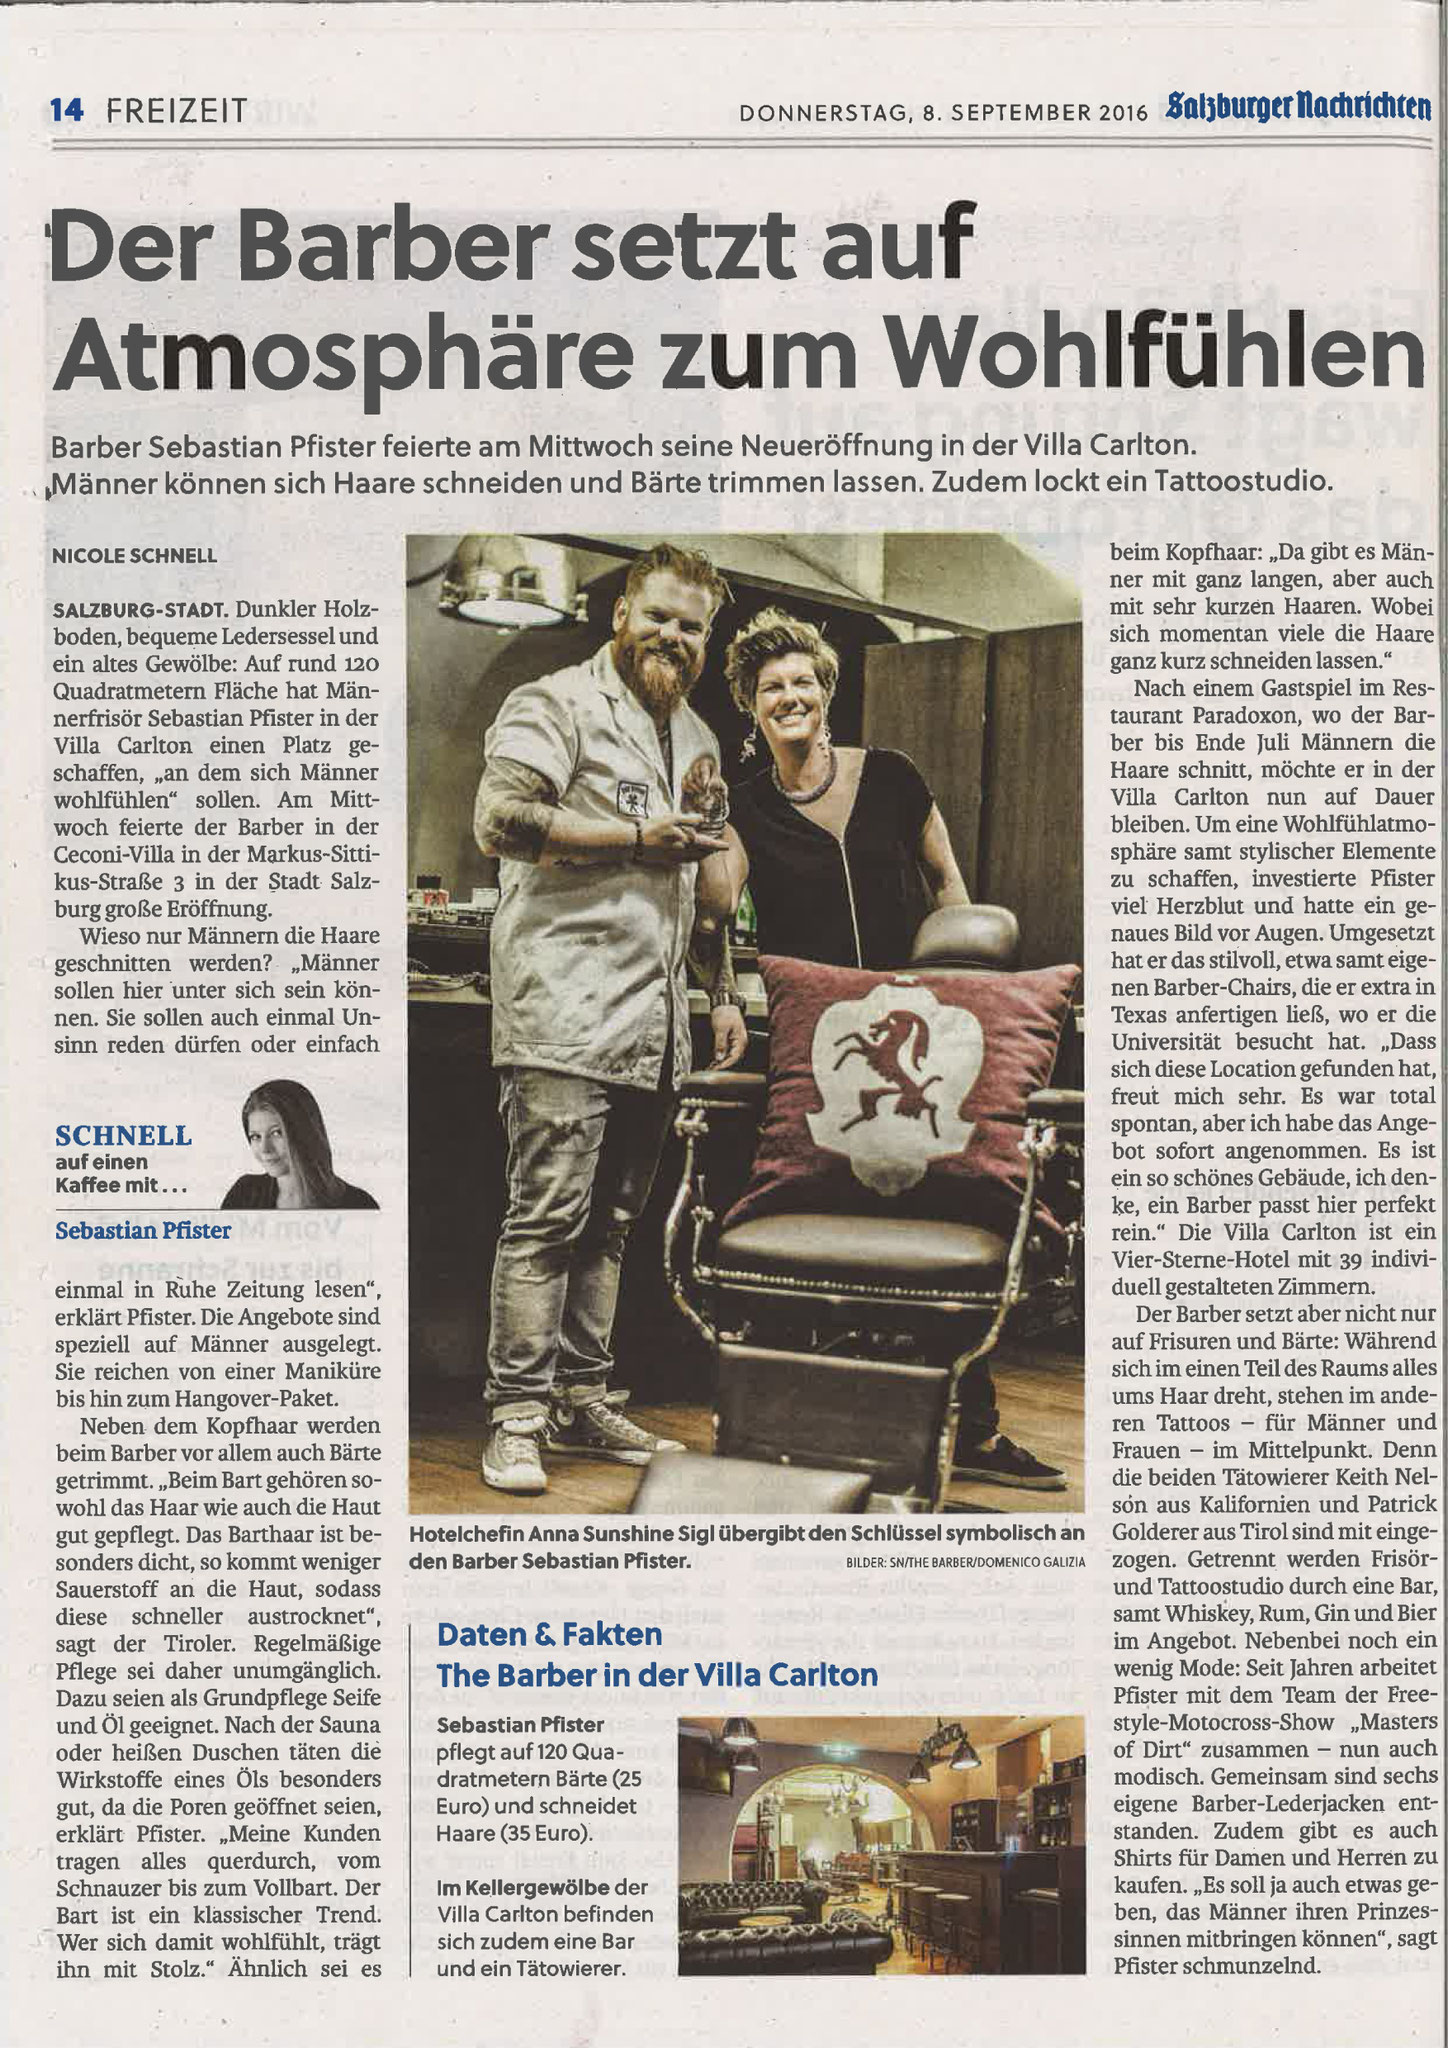 Salzburger Nachrichten, 8. September 2016